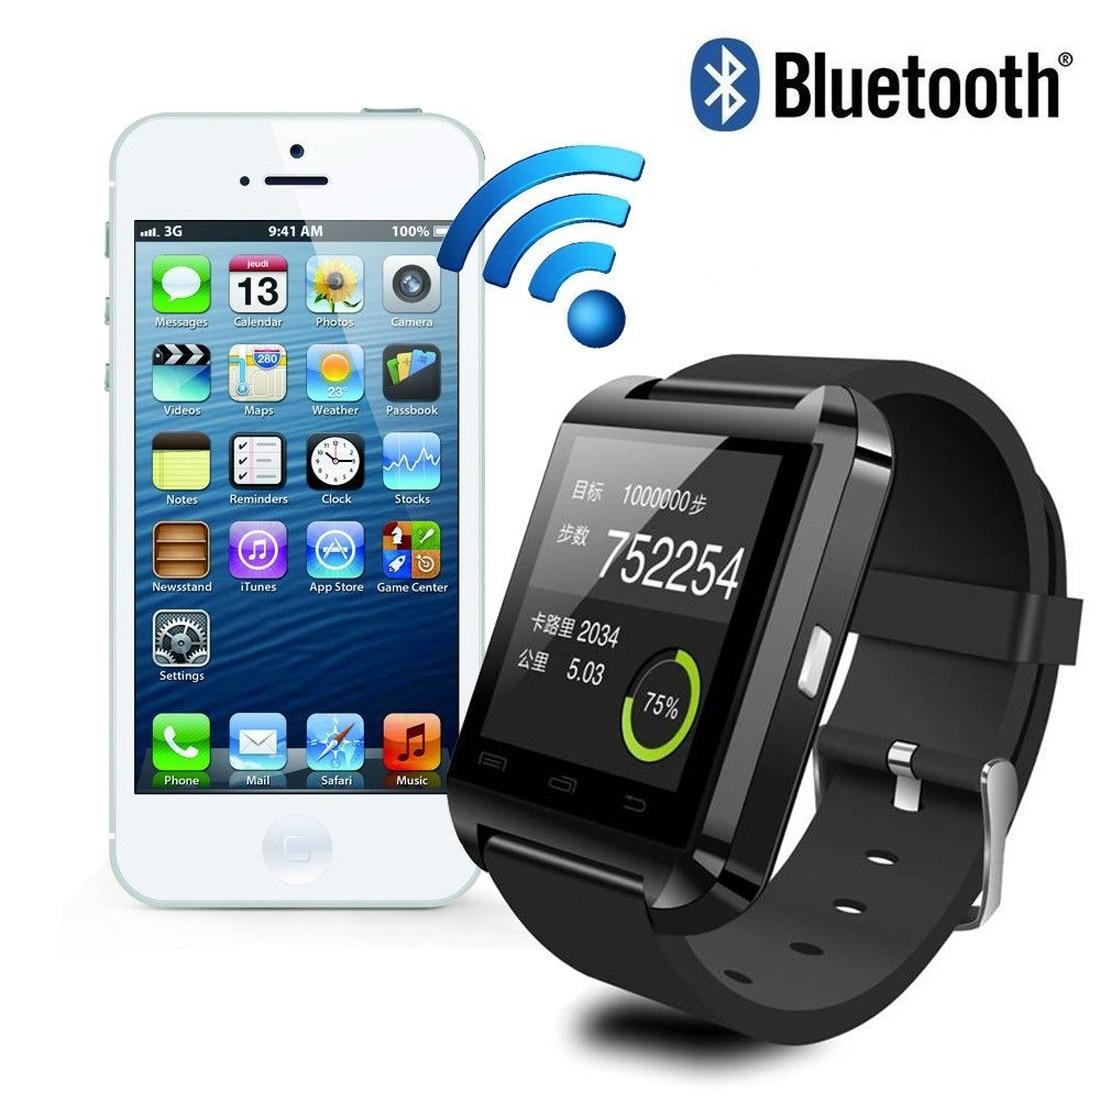 İPhone 4 / 4S / 5 / 5S / 6 və Samsung S4 / Qeyd / s6 HTC Android Smartphone üçün Bluetooth ağıllı saat U8 Sensorlu ekran Smartwatch